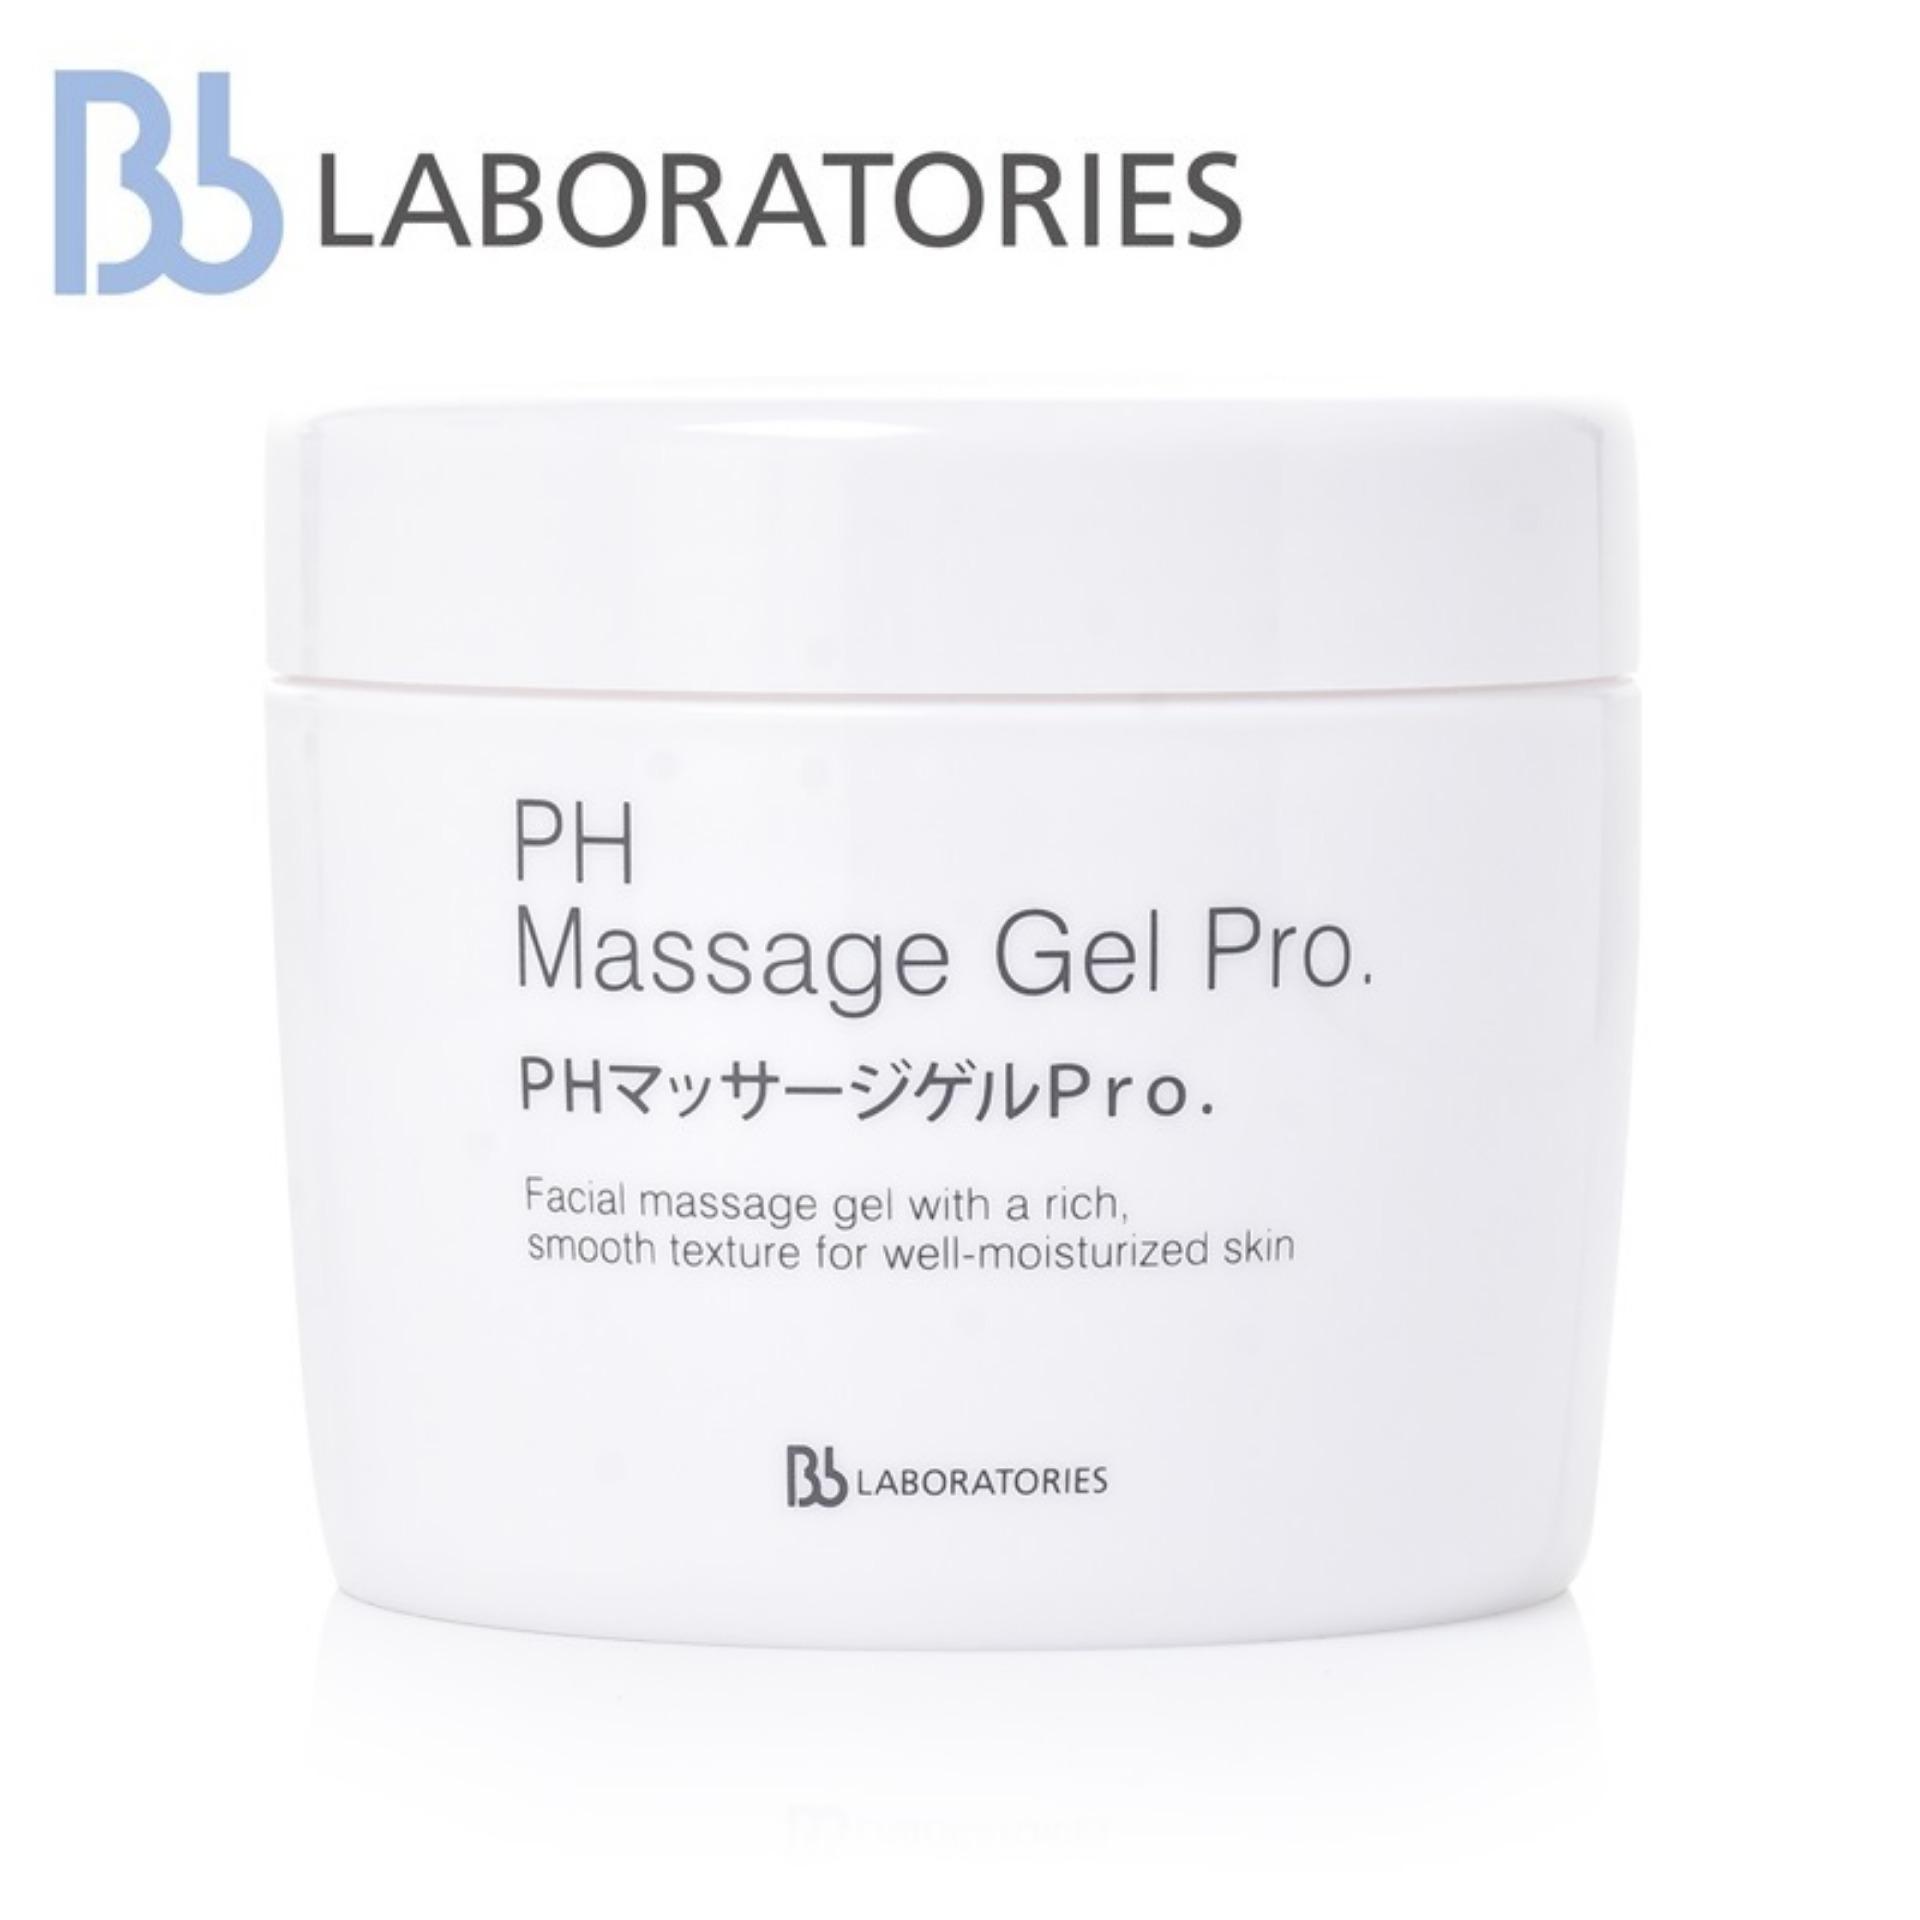 Price Bb Laboratories Ph Massage Gel Pro 300G Bb Laboratories Original